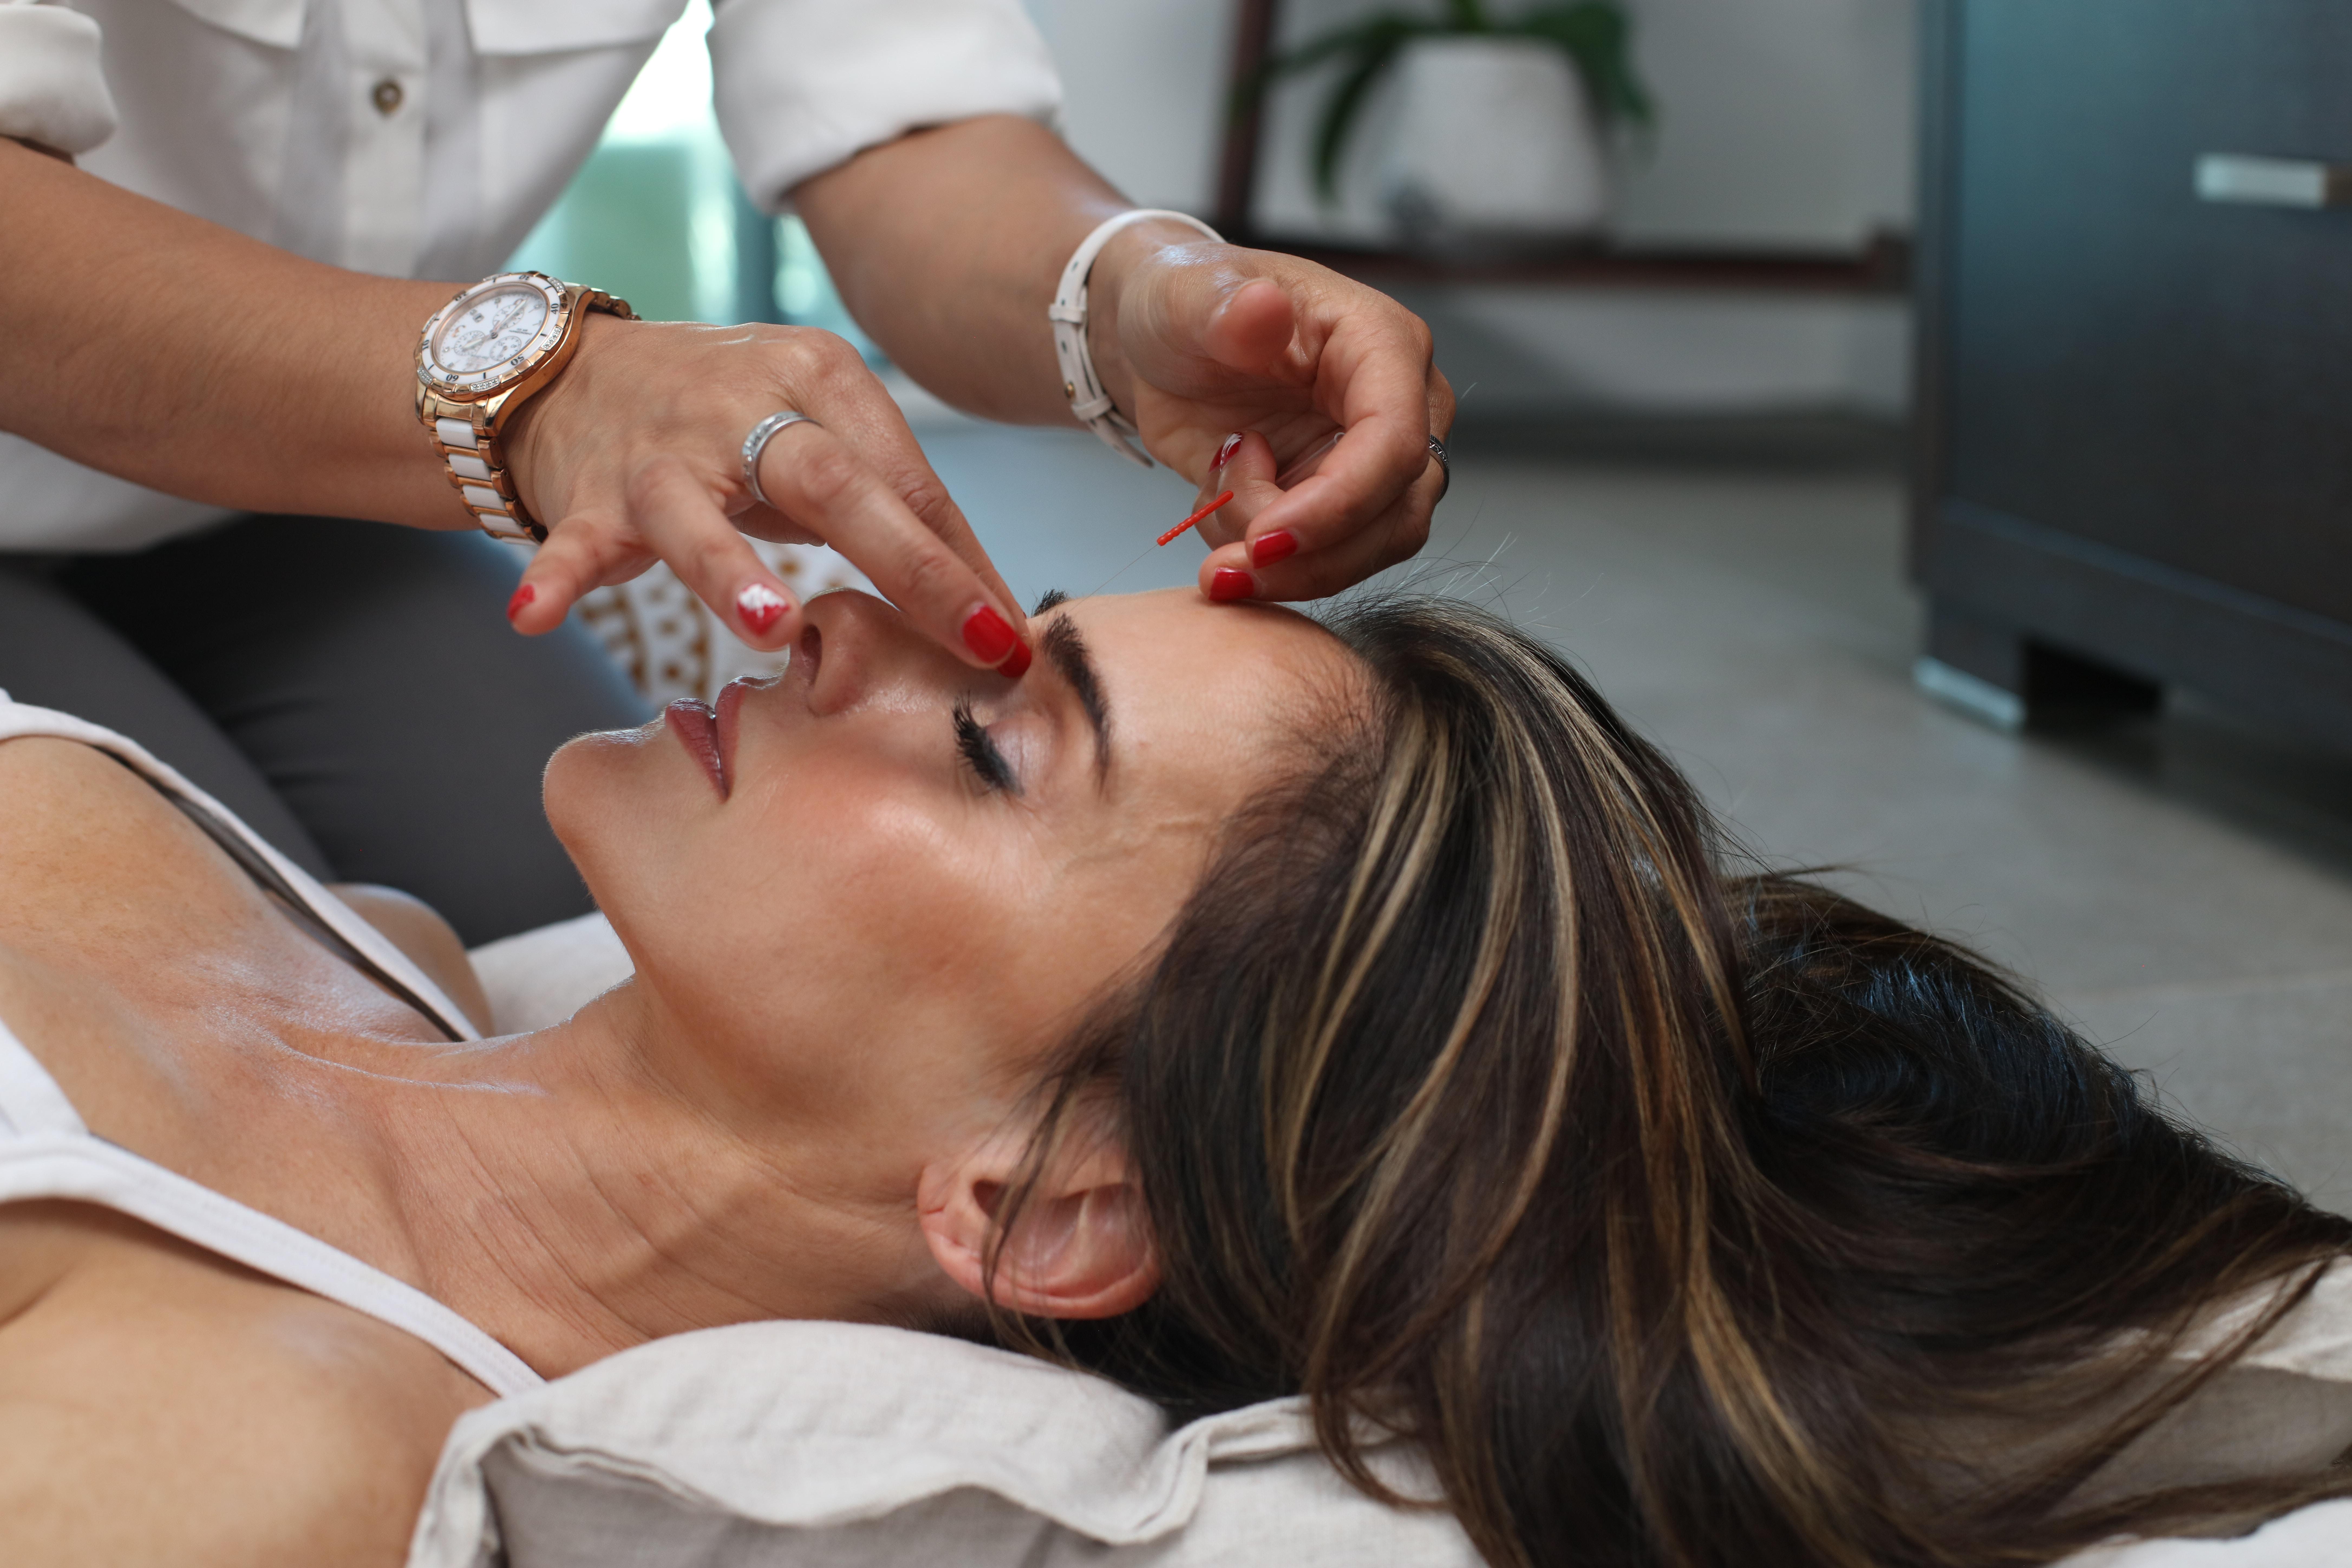 5 TikTok Skincare Trends You Should Avoid